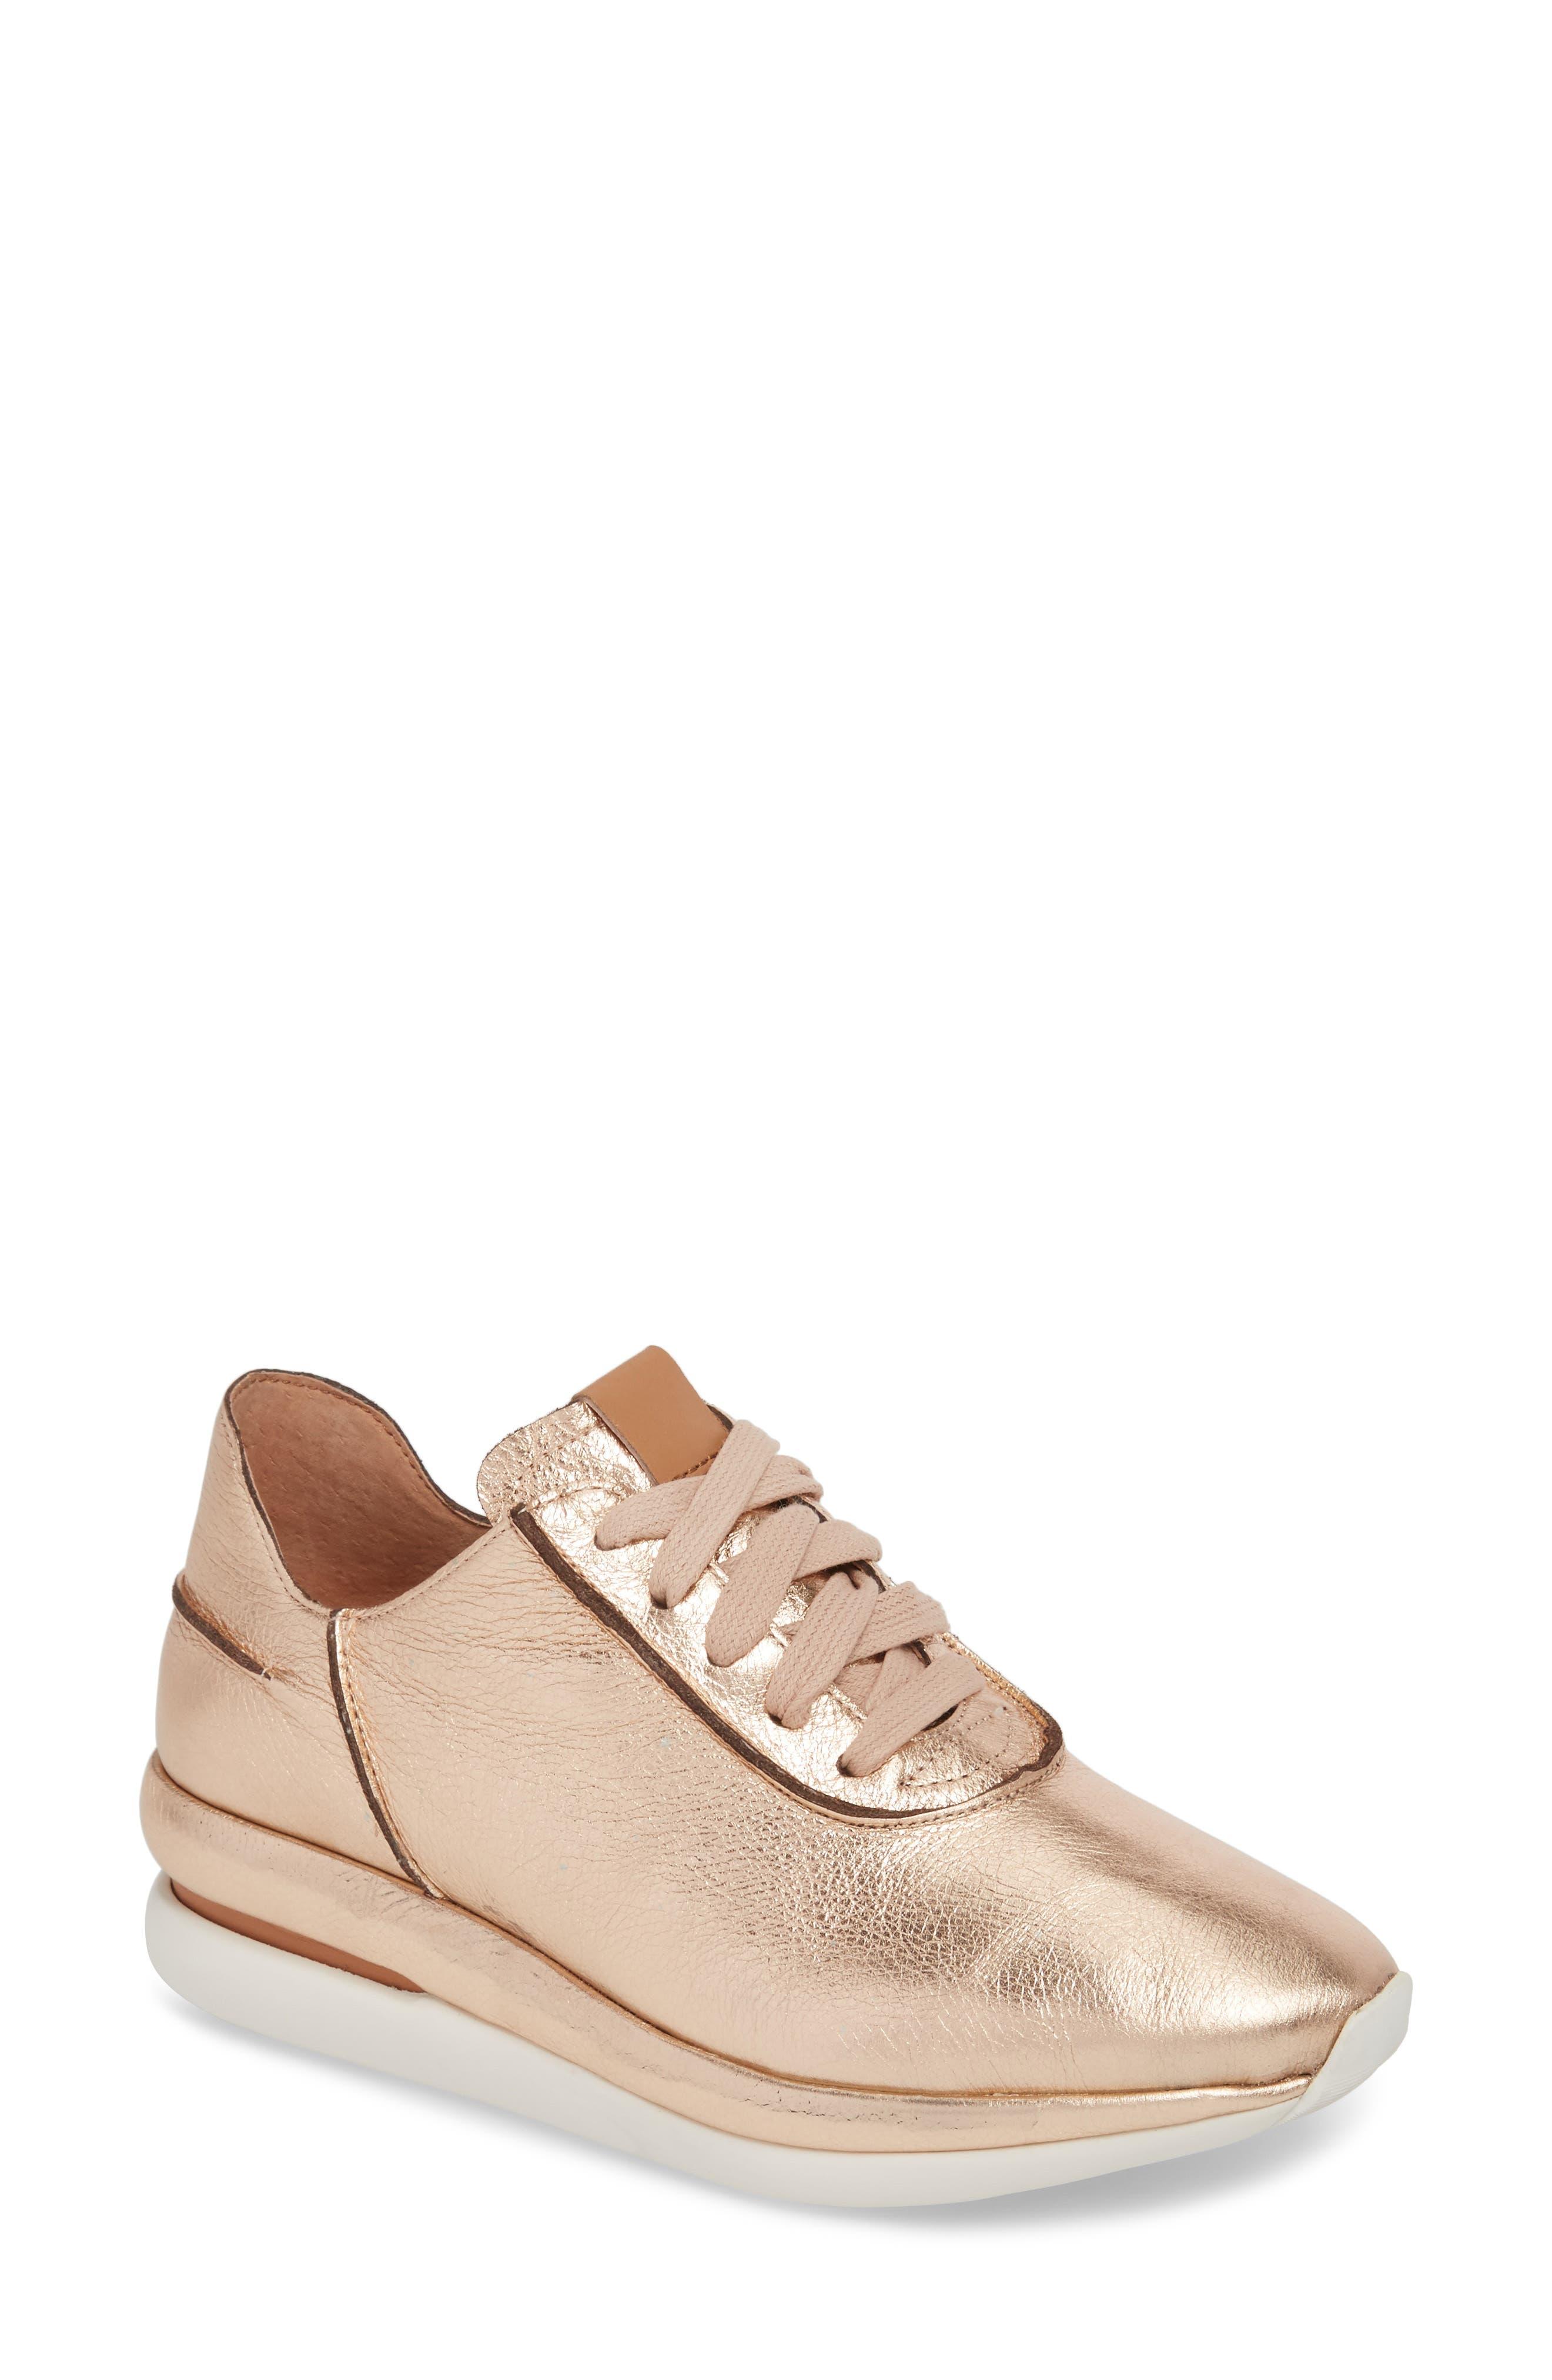 Raina Sneaker,                             Main thumbnail 1, color,                             ROSE GOLD METALLIC LEATHER